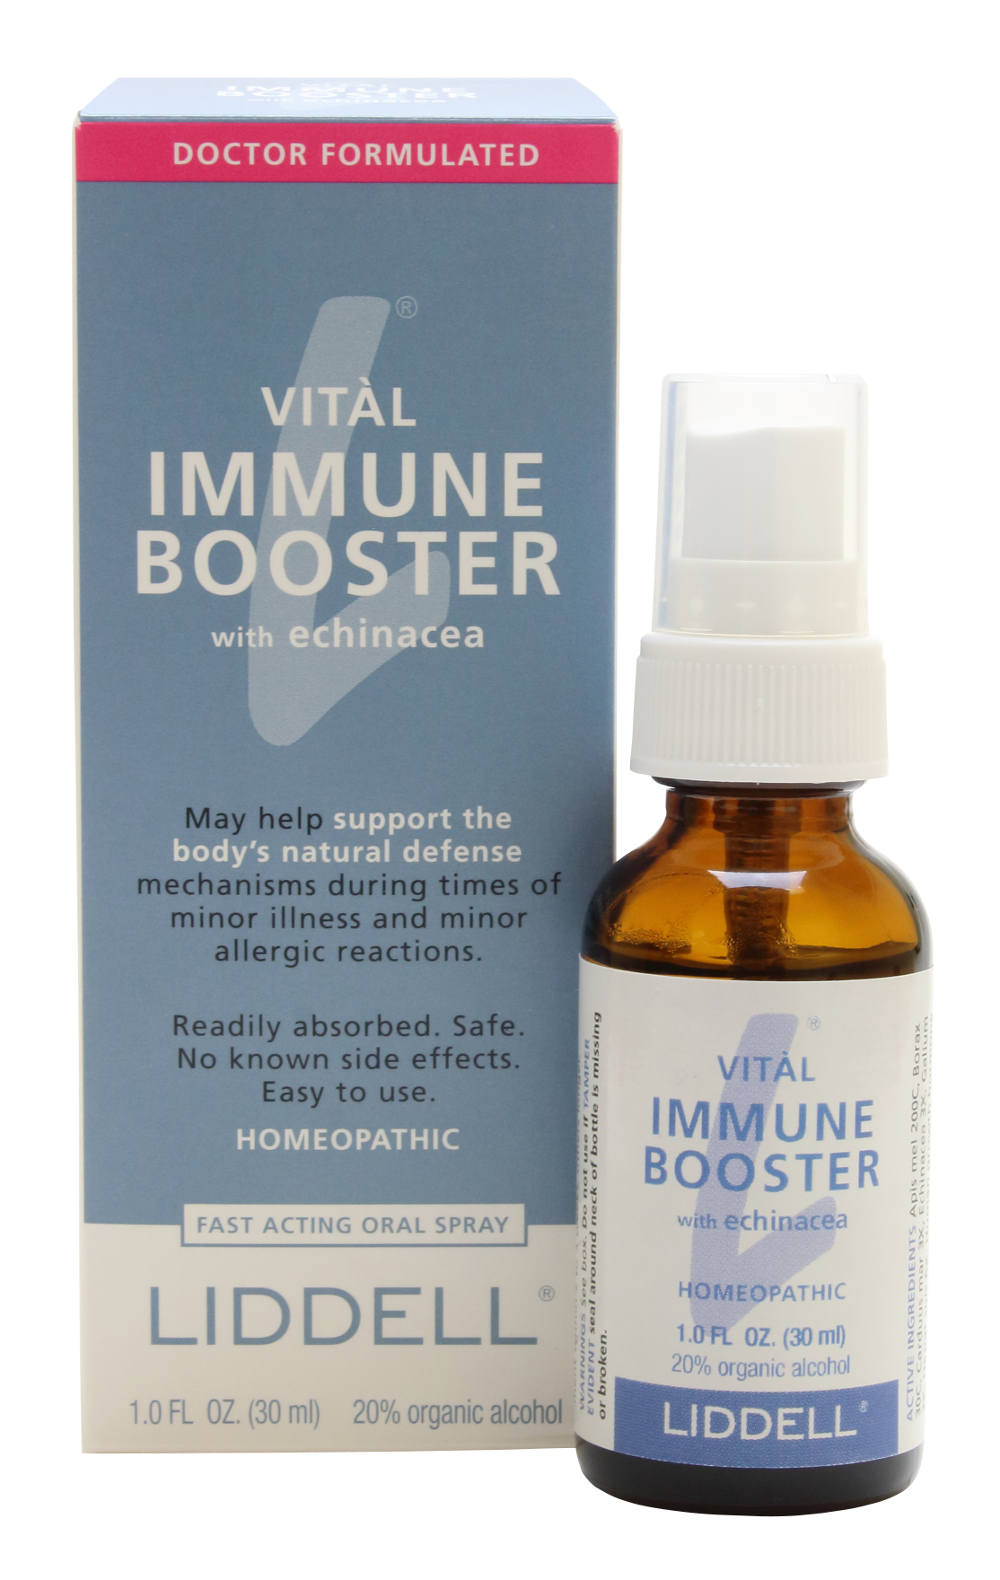 Vital Immune Booster